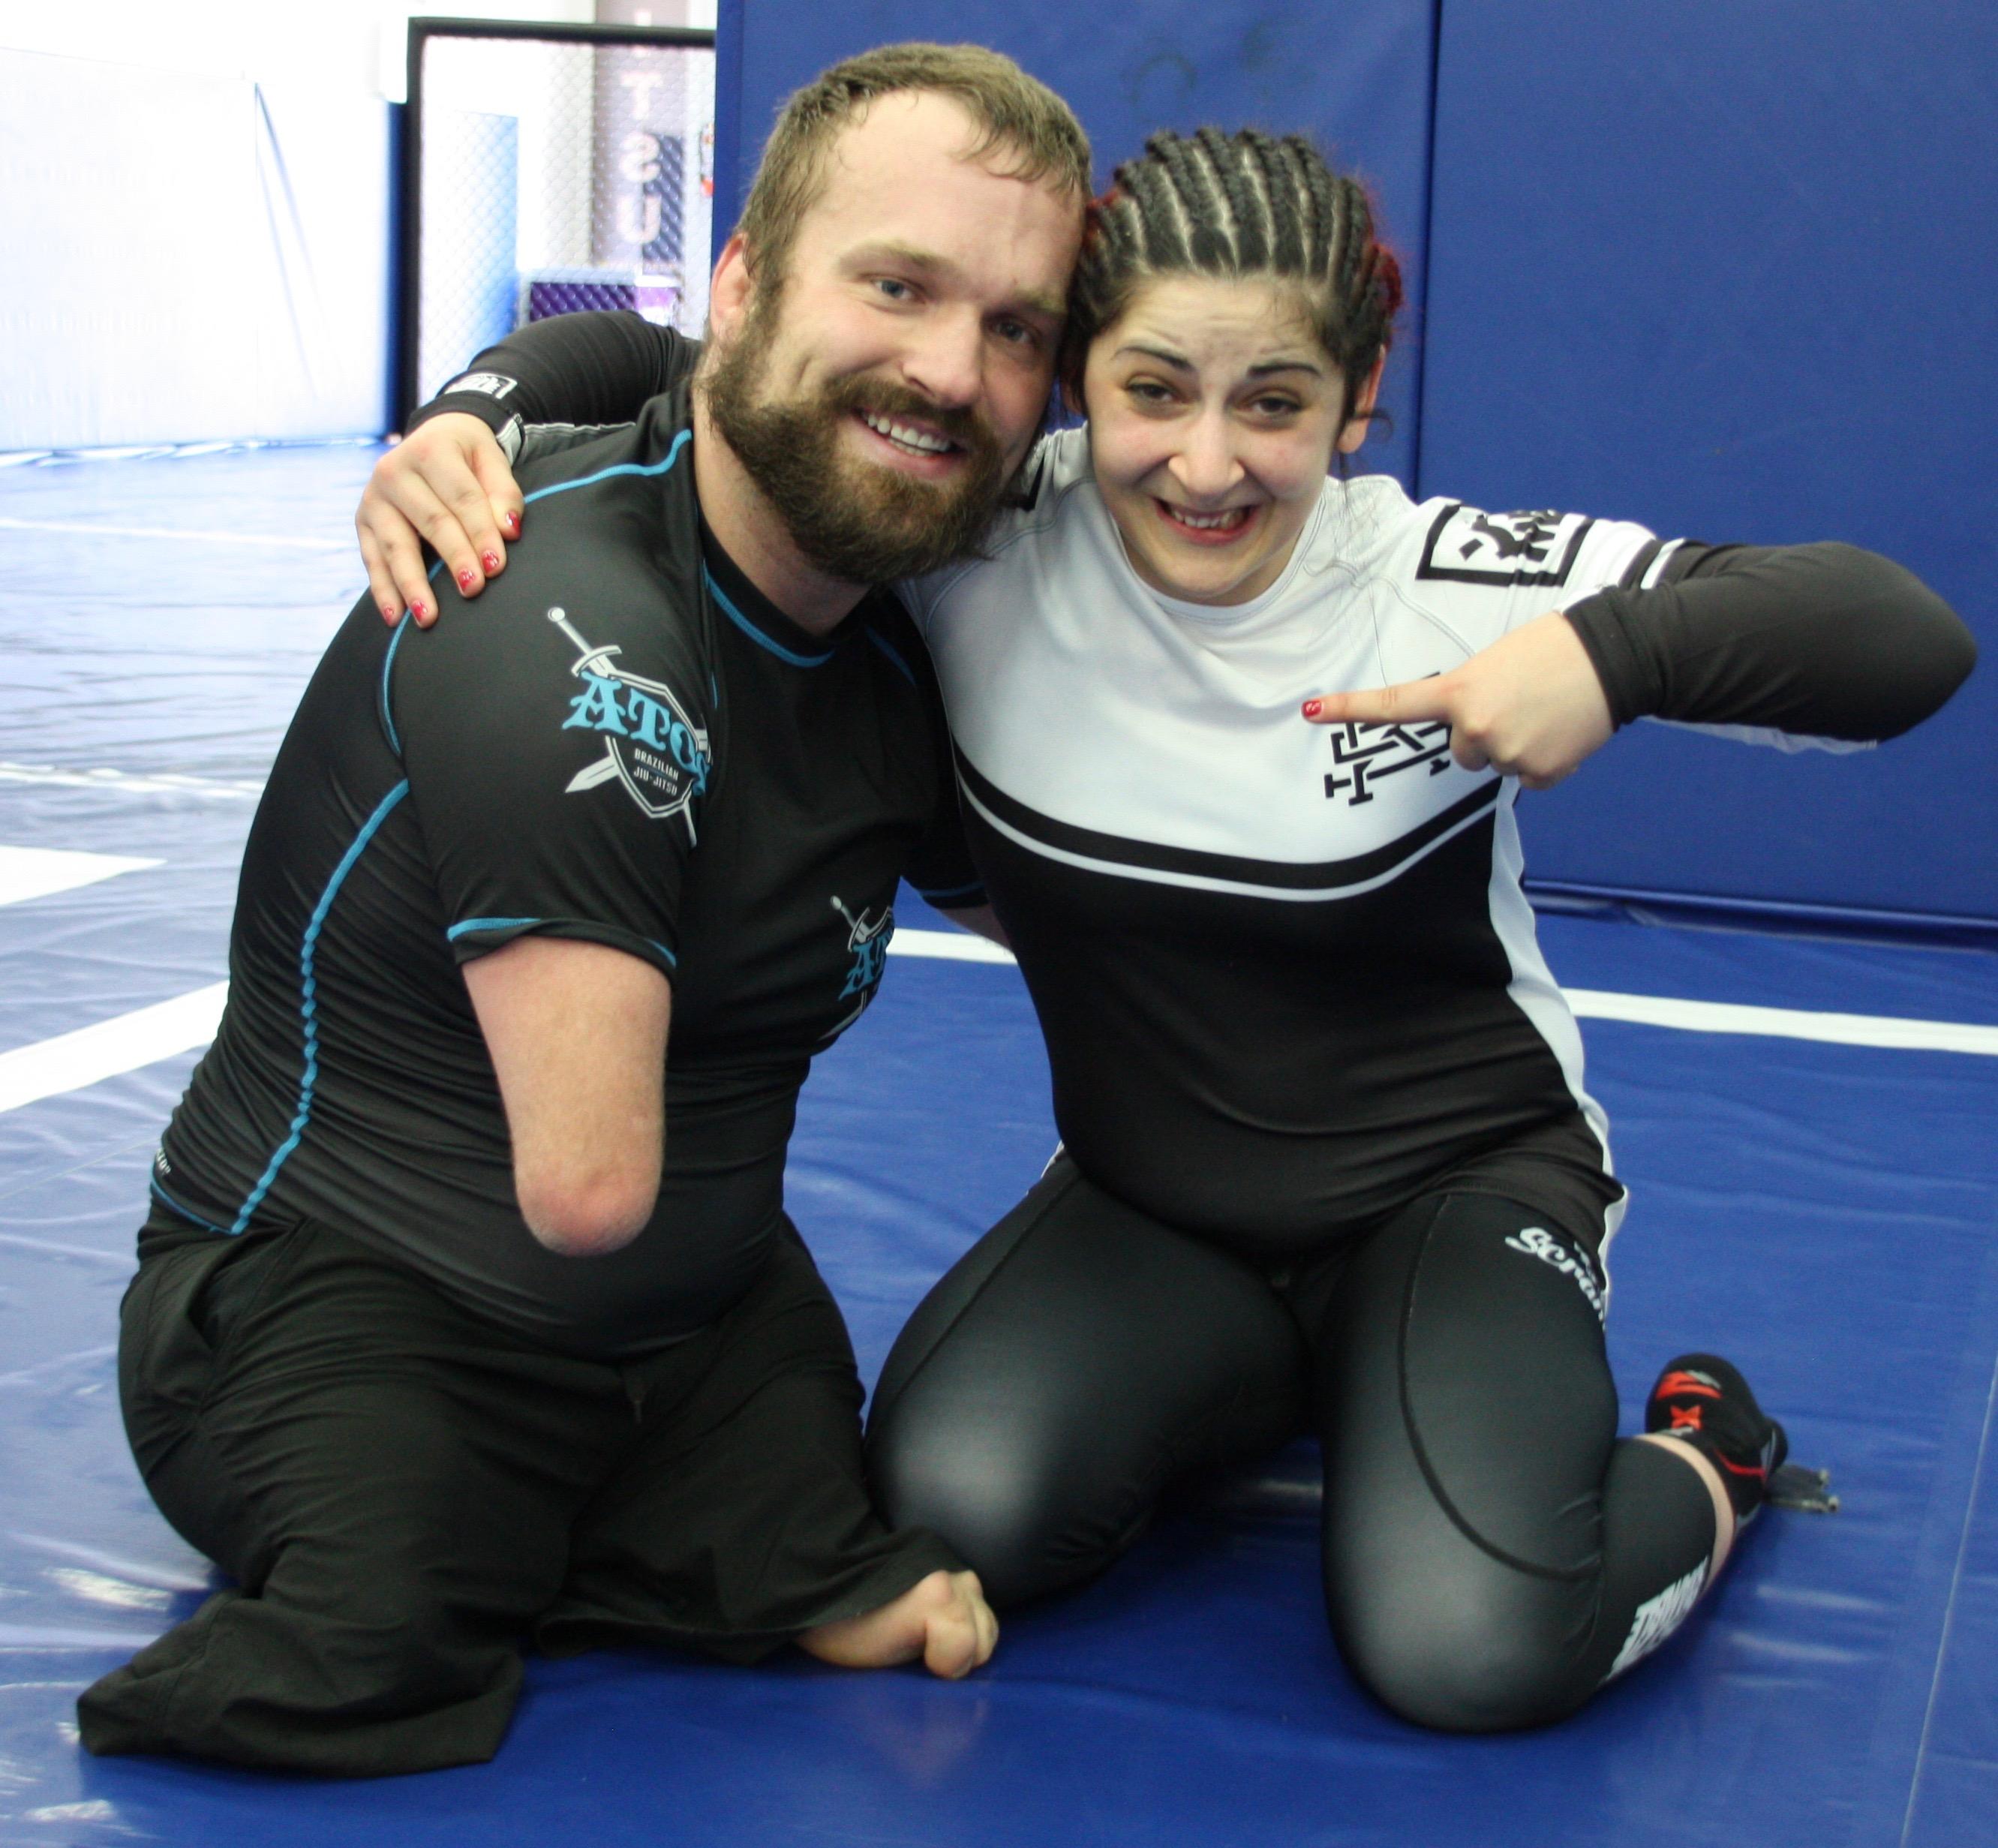 Gina and Kyle Meynard